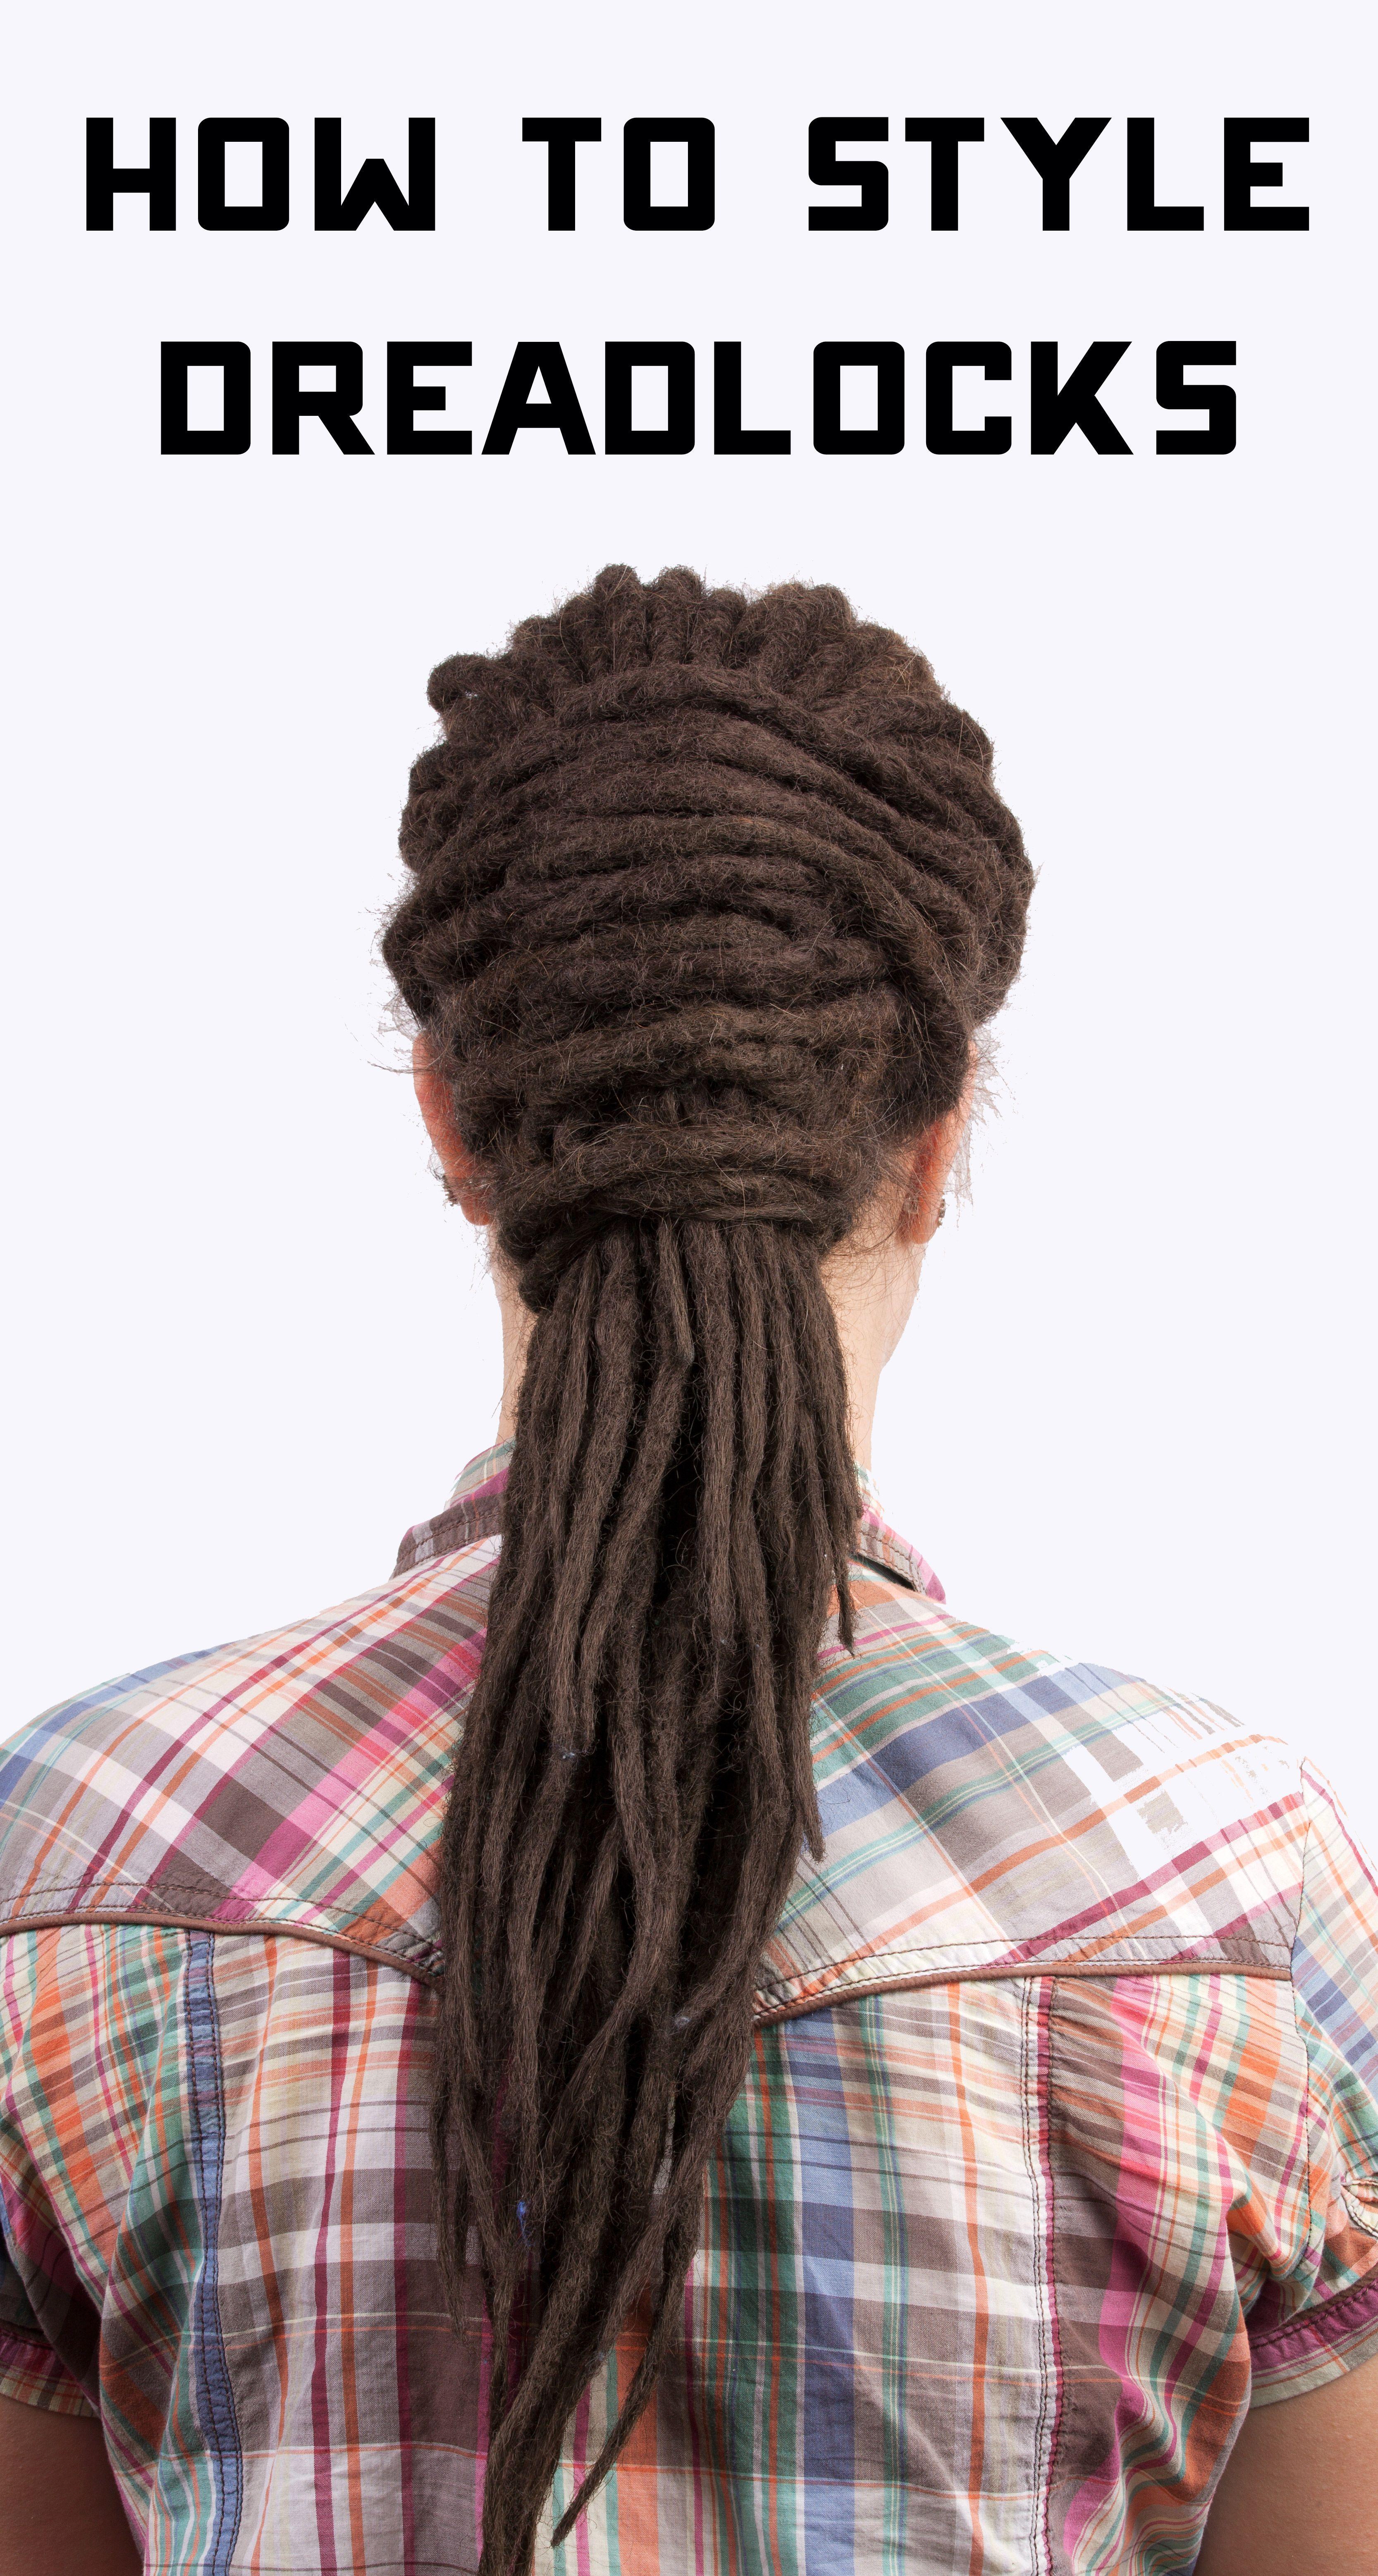 How To Style Dreadlocks Ways To Style Dreadlocks Hair Braiding